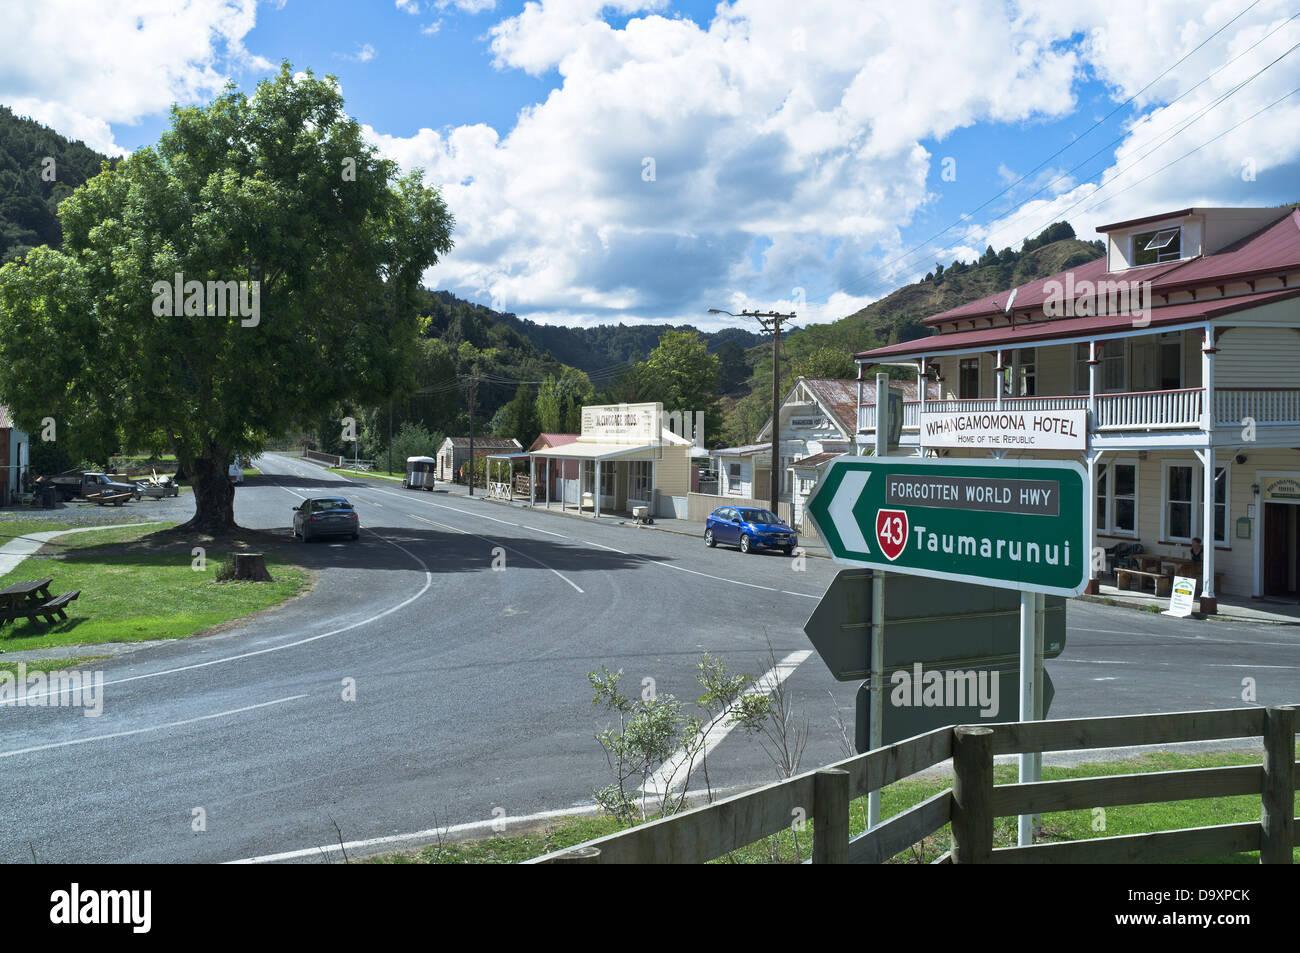 dh Forgotten World Highway WHANGAMOMONA NEW ZEALAND SH43 state highway road signpost and Whangamomna Hotel - Stock Image